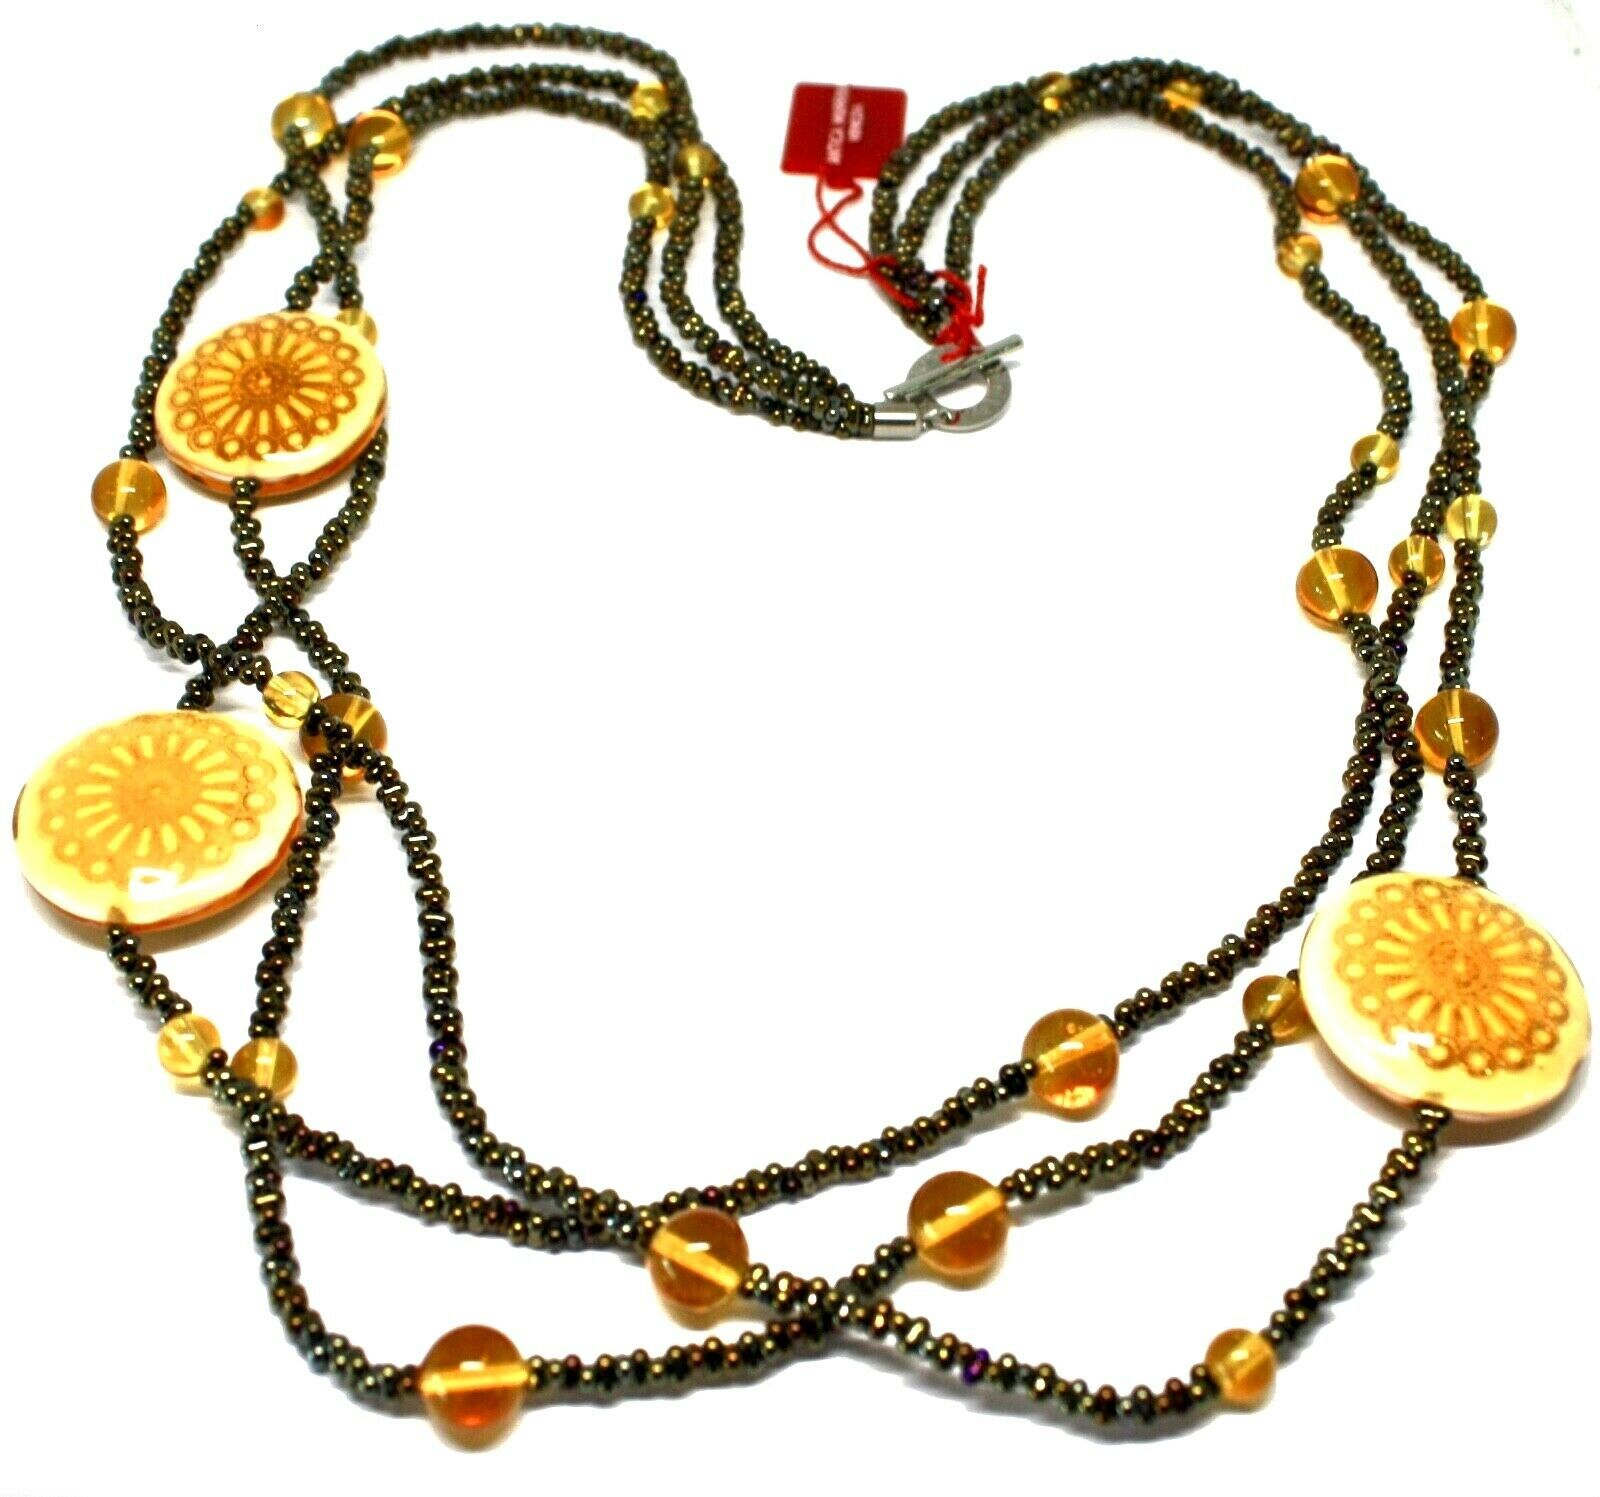 Necklace Antica Murrina Venezia with Glass of Murno Disc Beige & Gold CO724A10